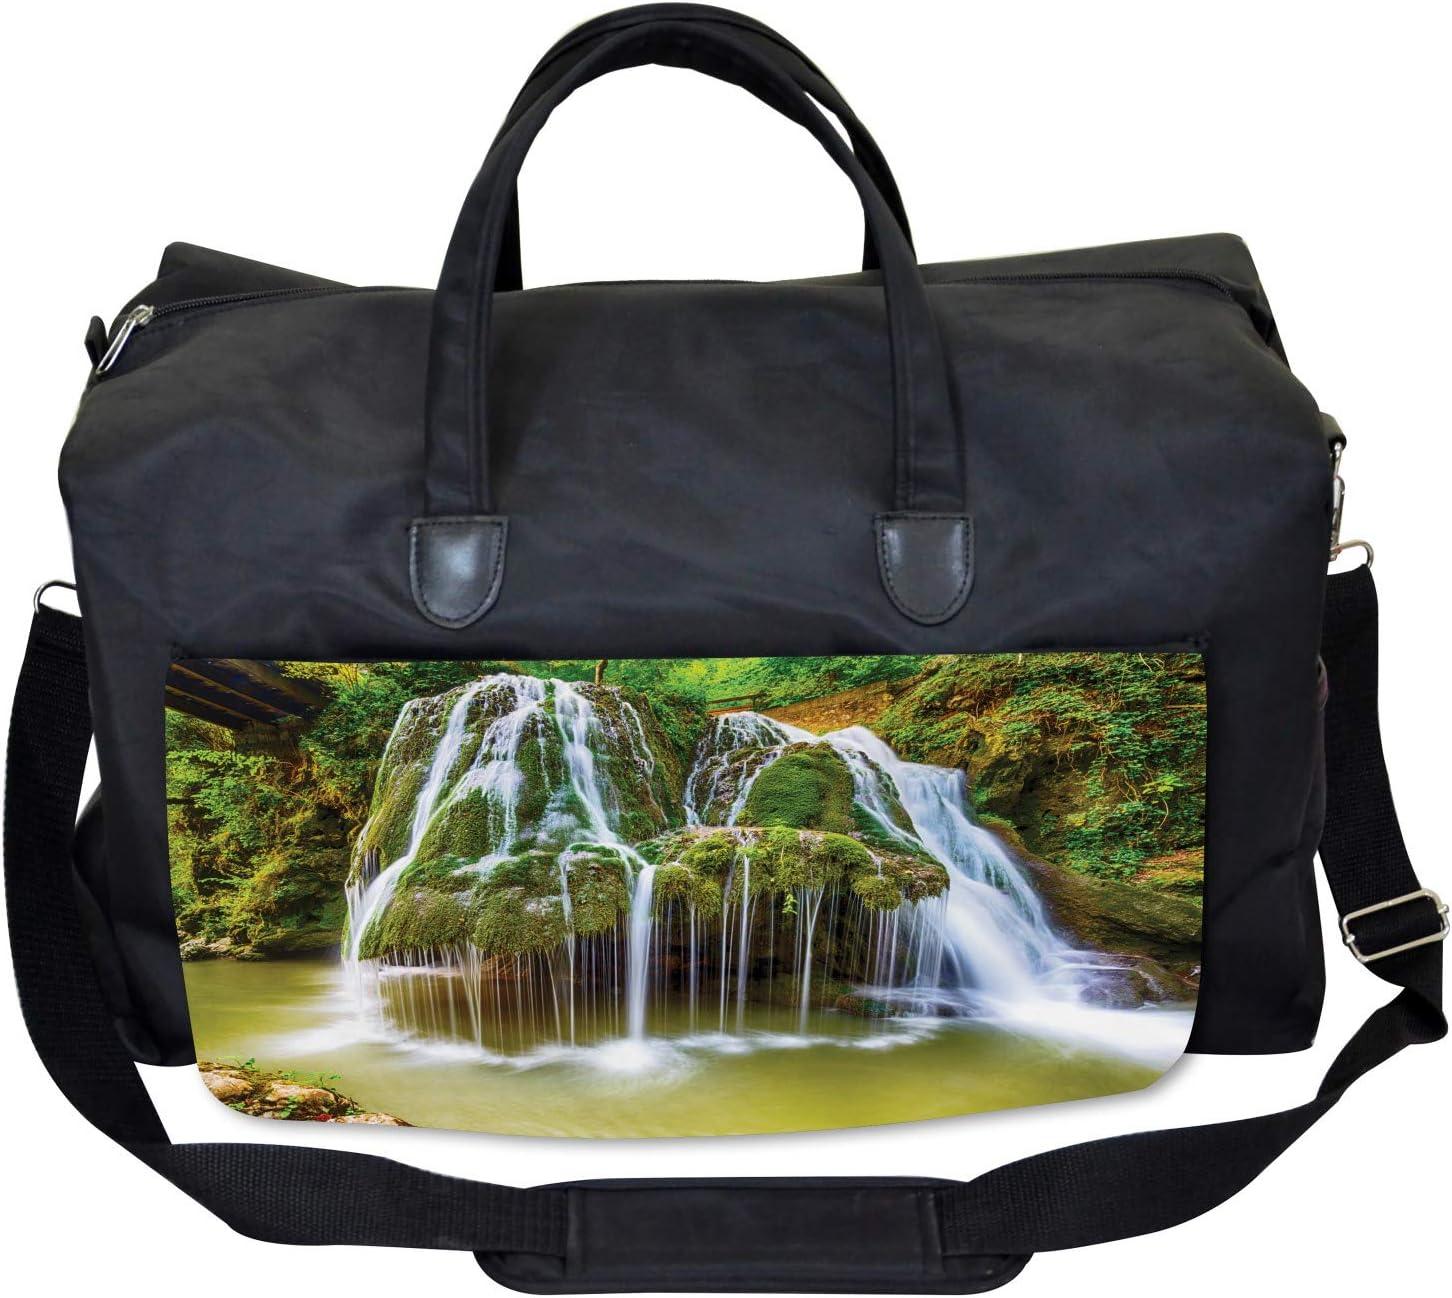 Large Weekender Carry-on Ambesonne Scenery Gym Bag Botanic Plants in Lake